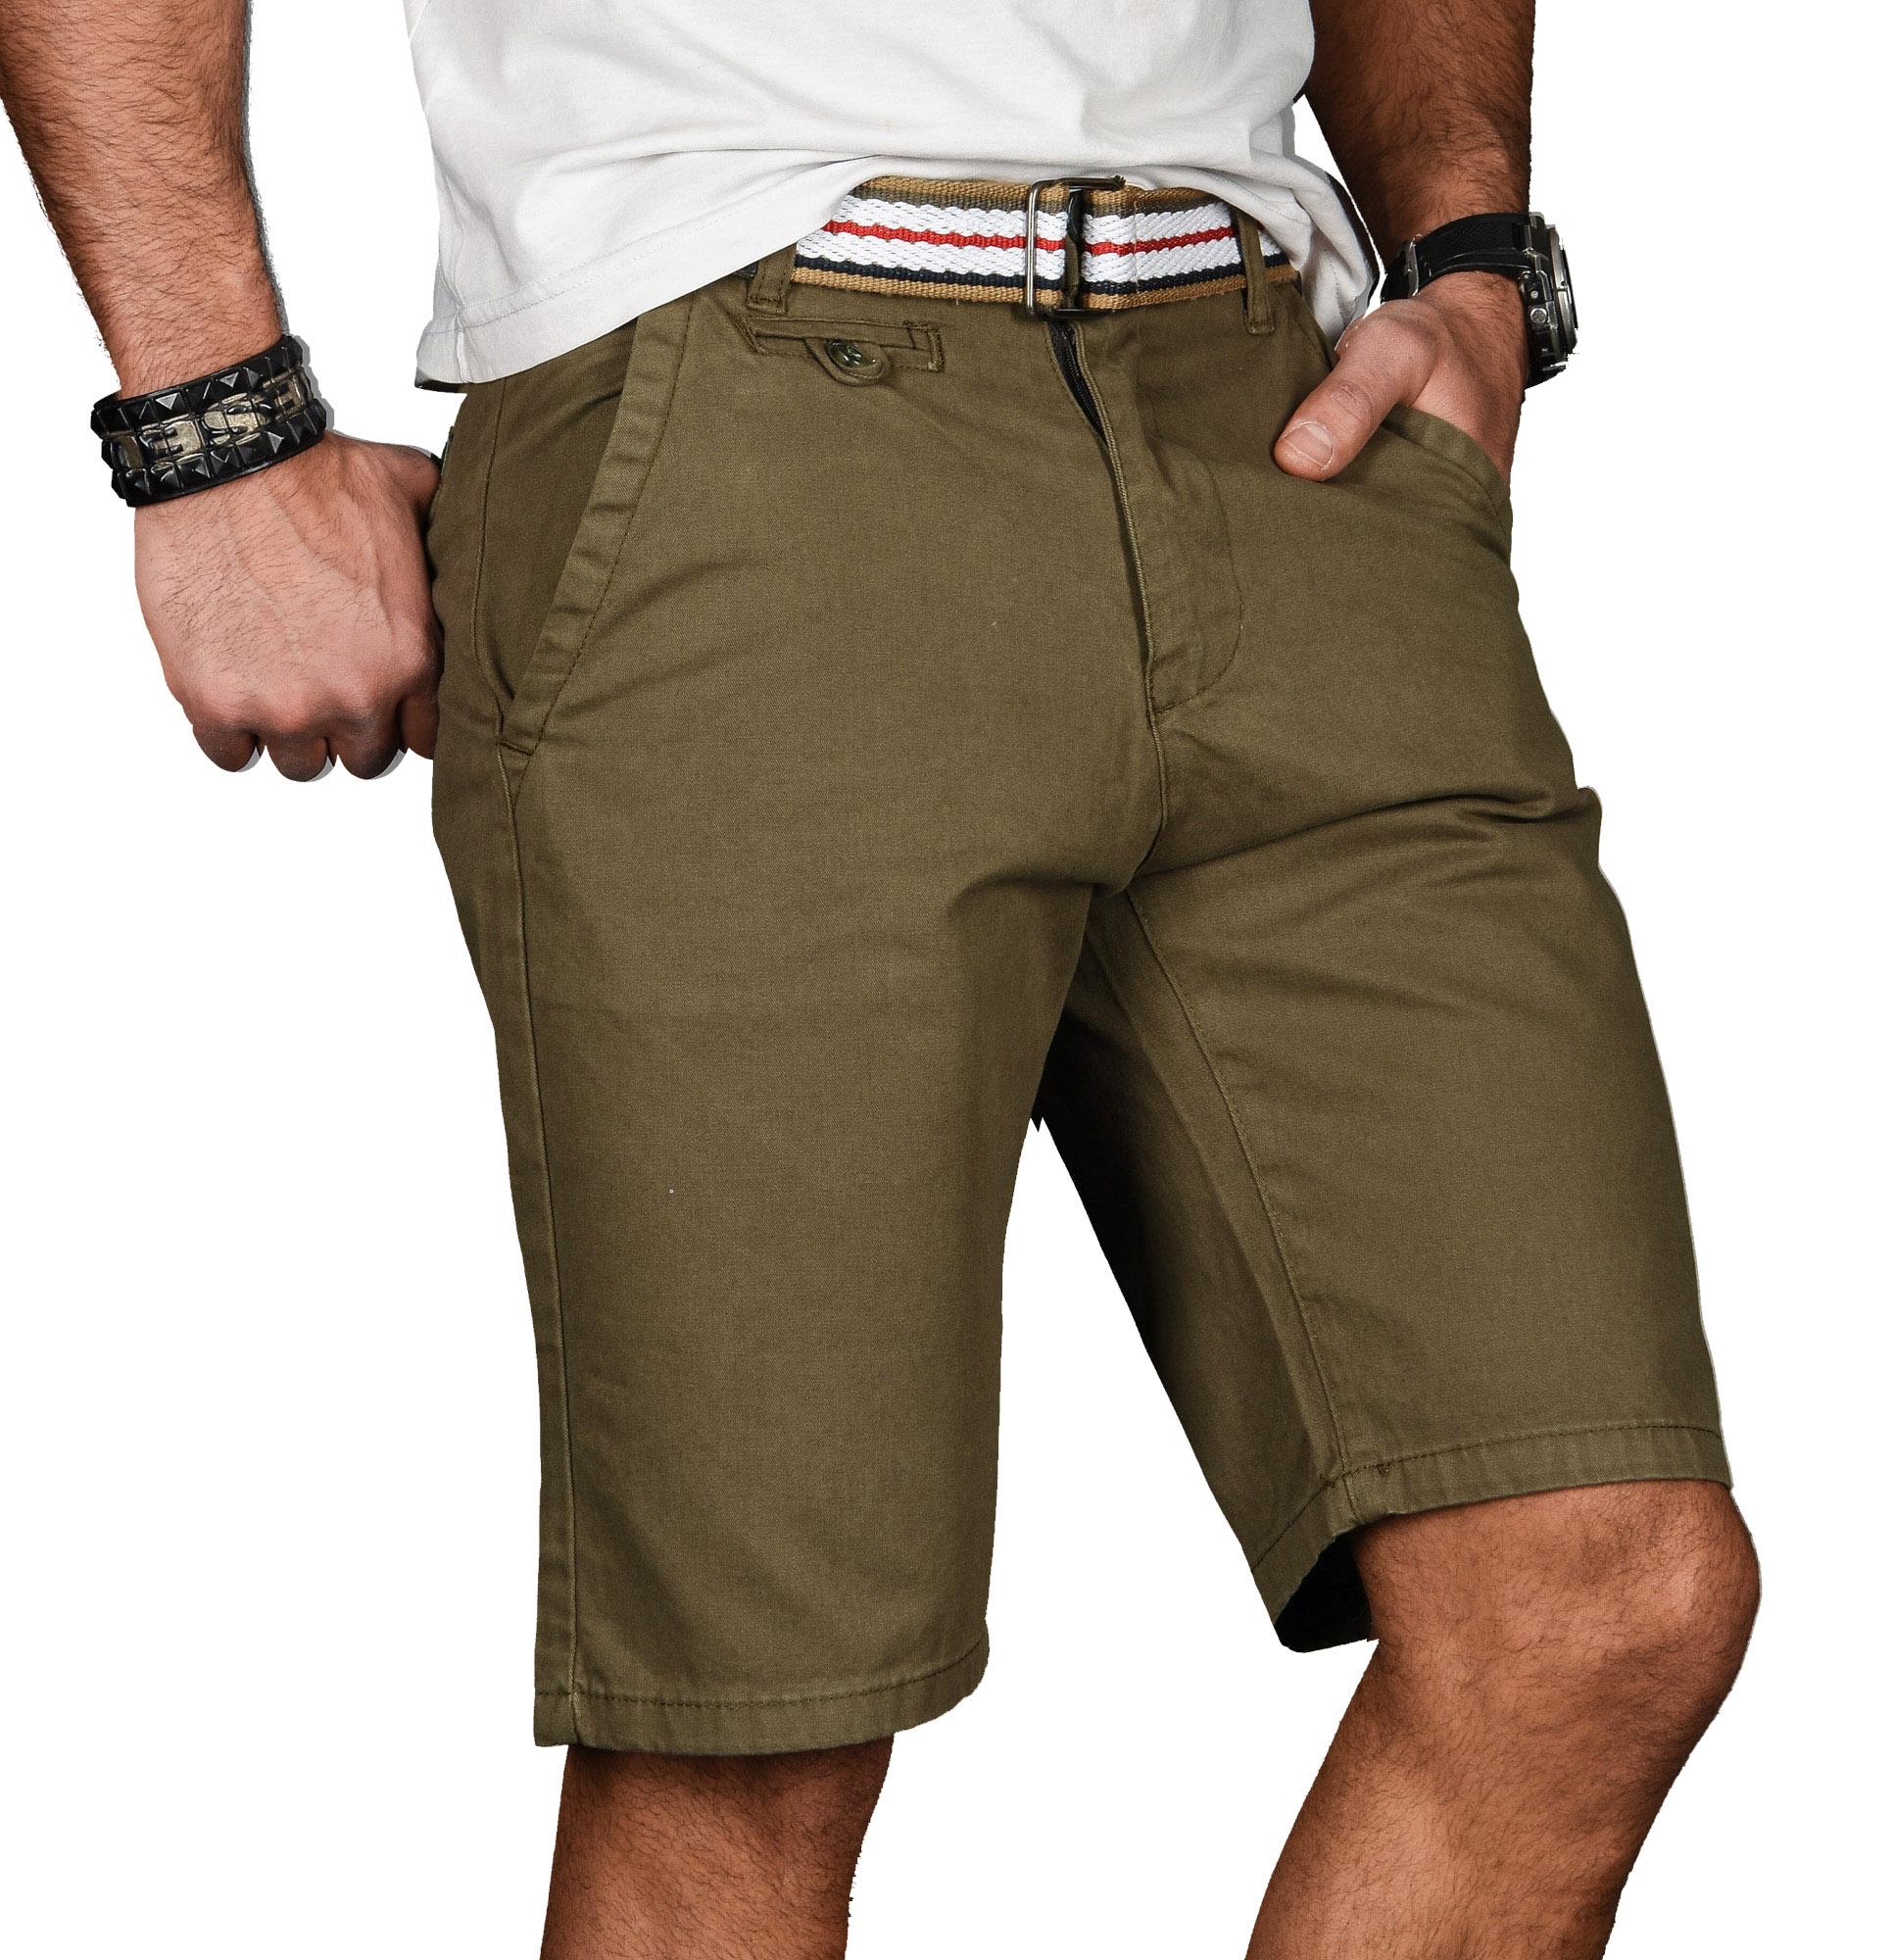 A-Salvarini-Herren-Shorts-kurze-Sommer-Hose-mit-Guertel-Short-Bermuda-NEU-AS096 Indexbild 30